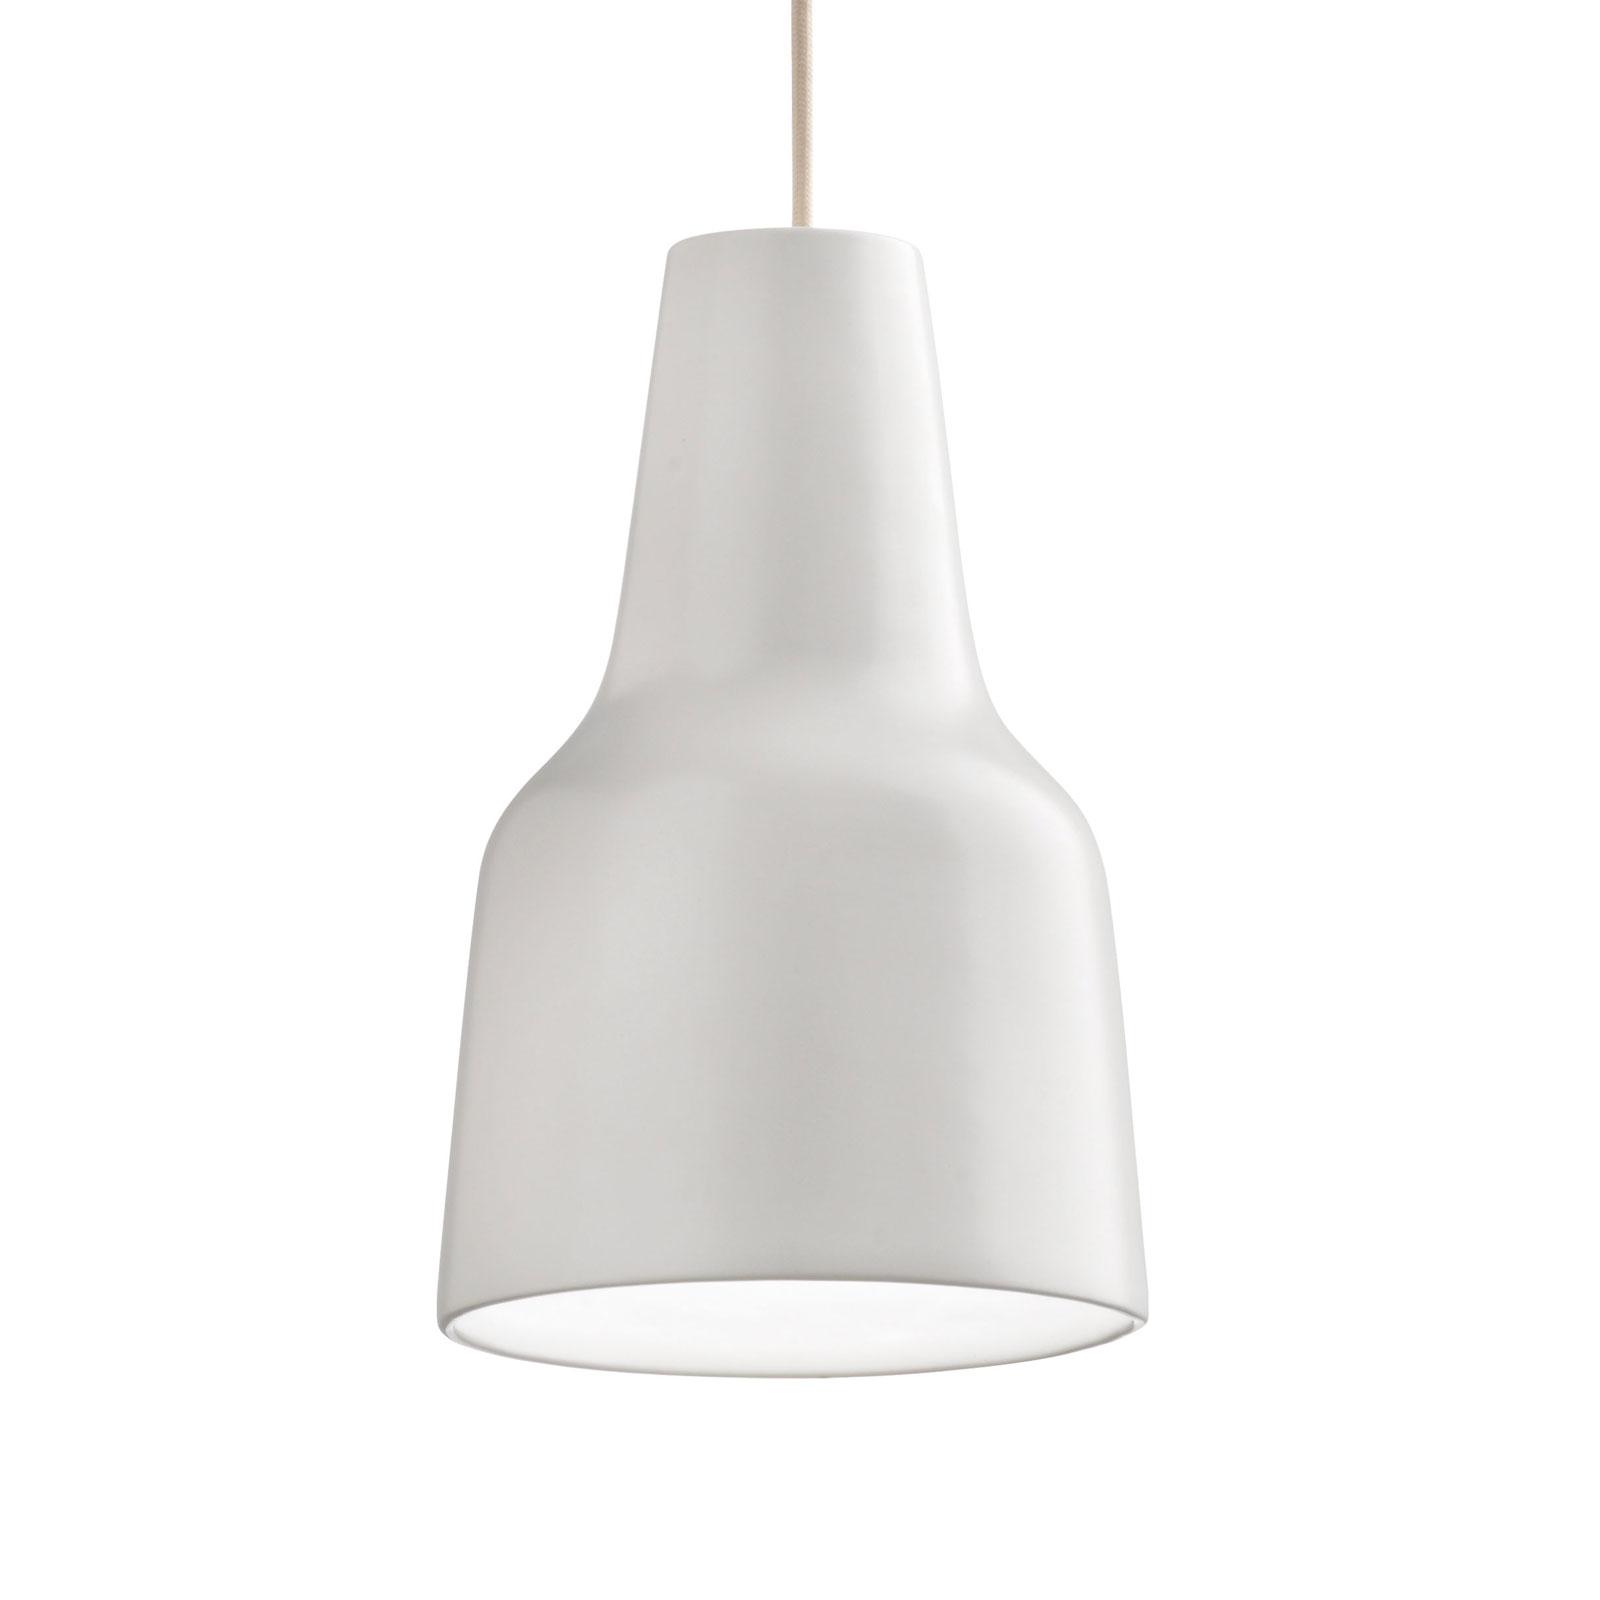 Modo Luce Eva pendellampe Ø 38 cm hvit